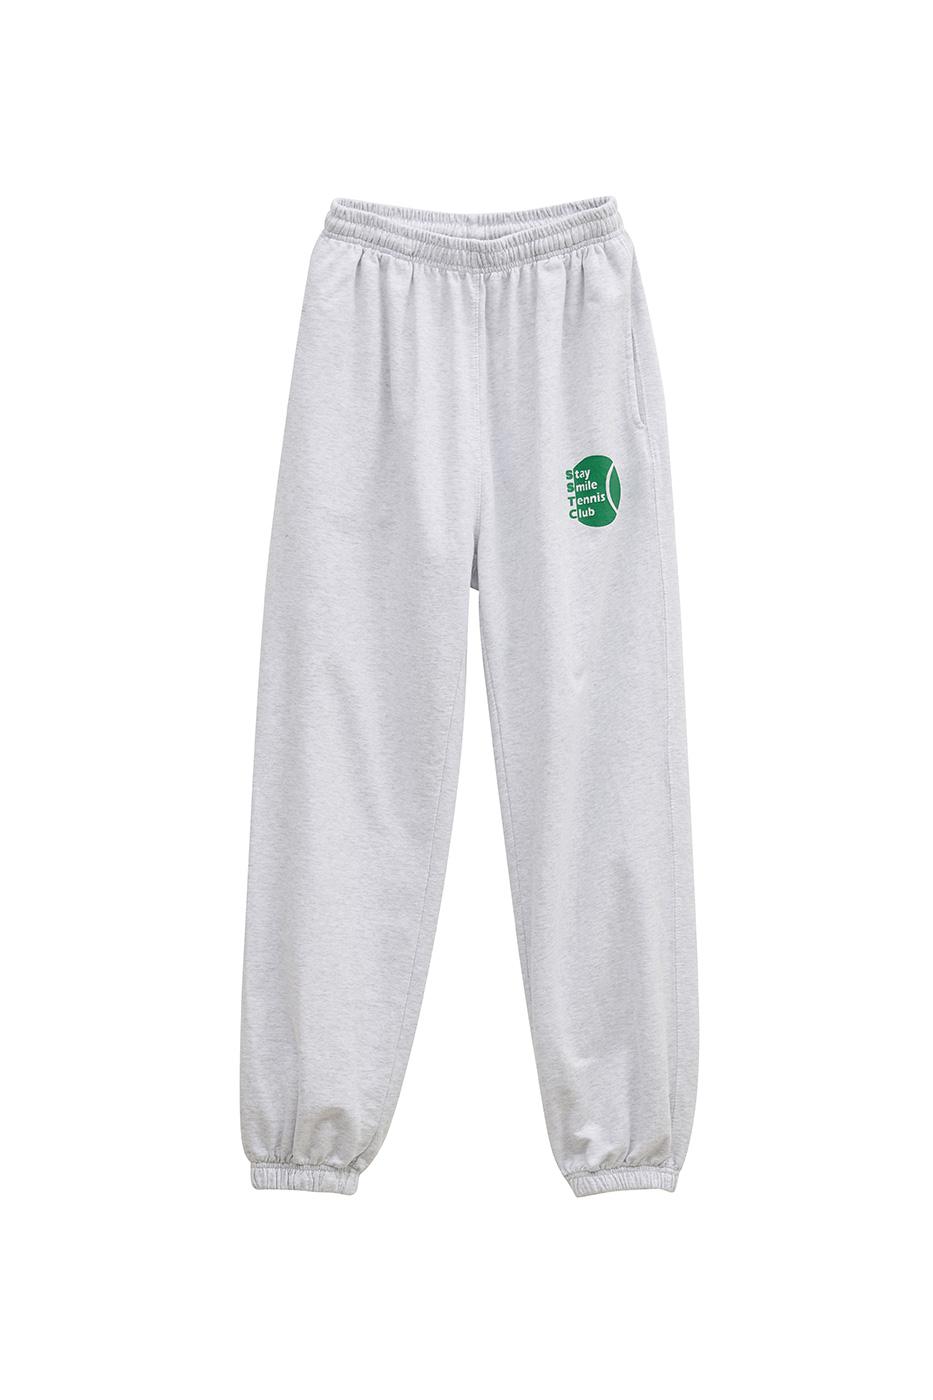 tennis club jogger pants